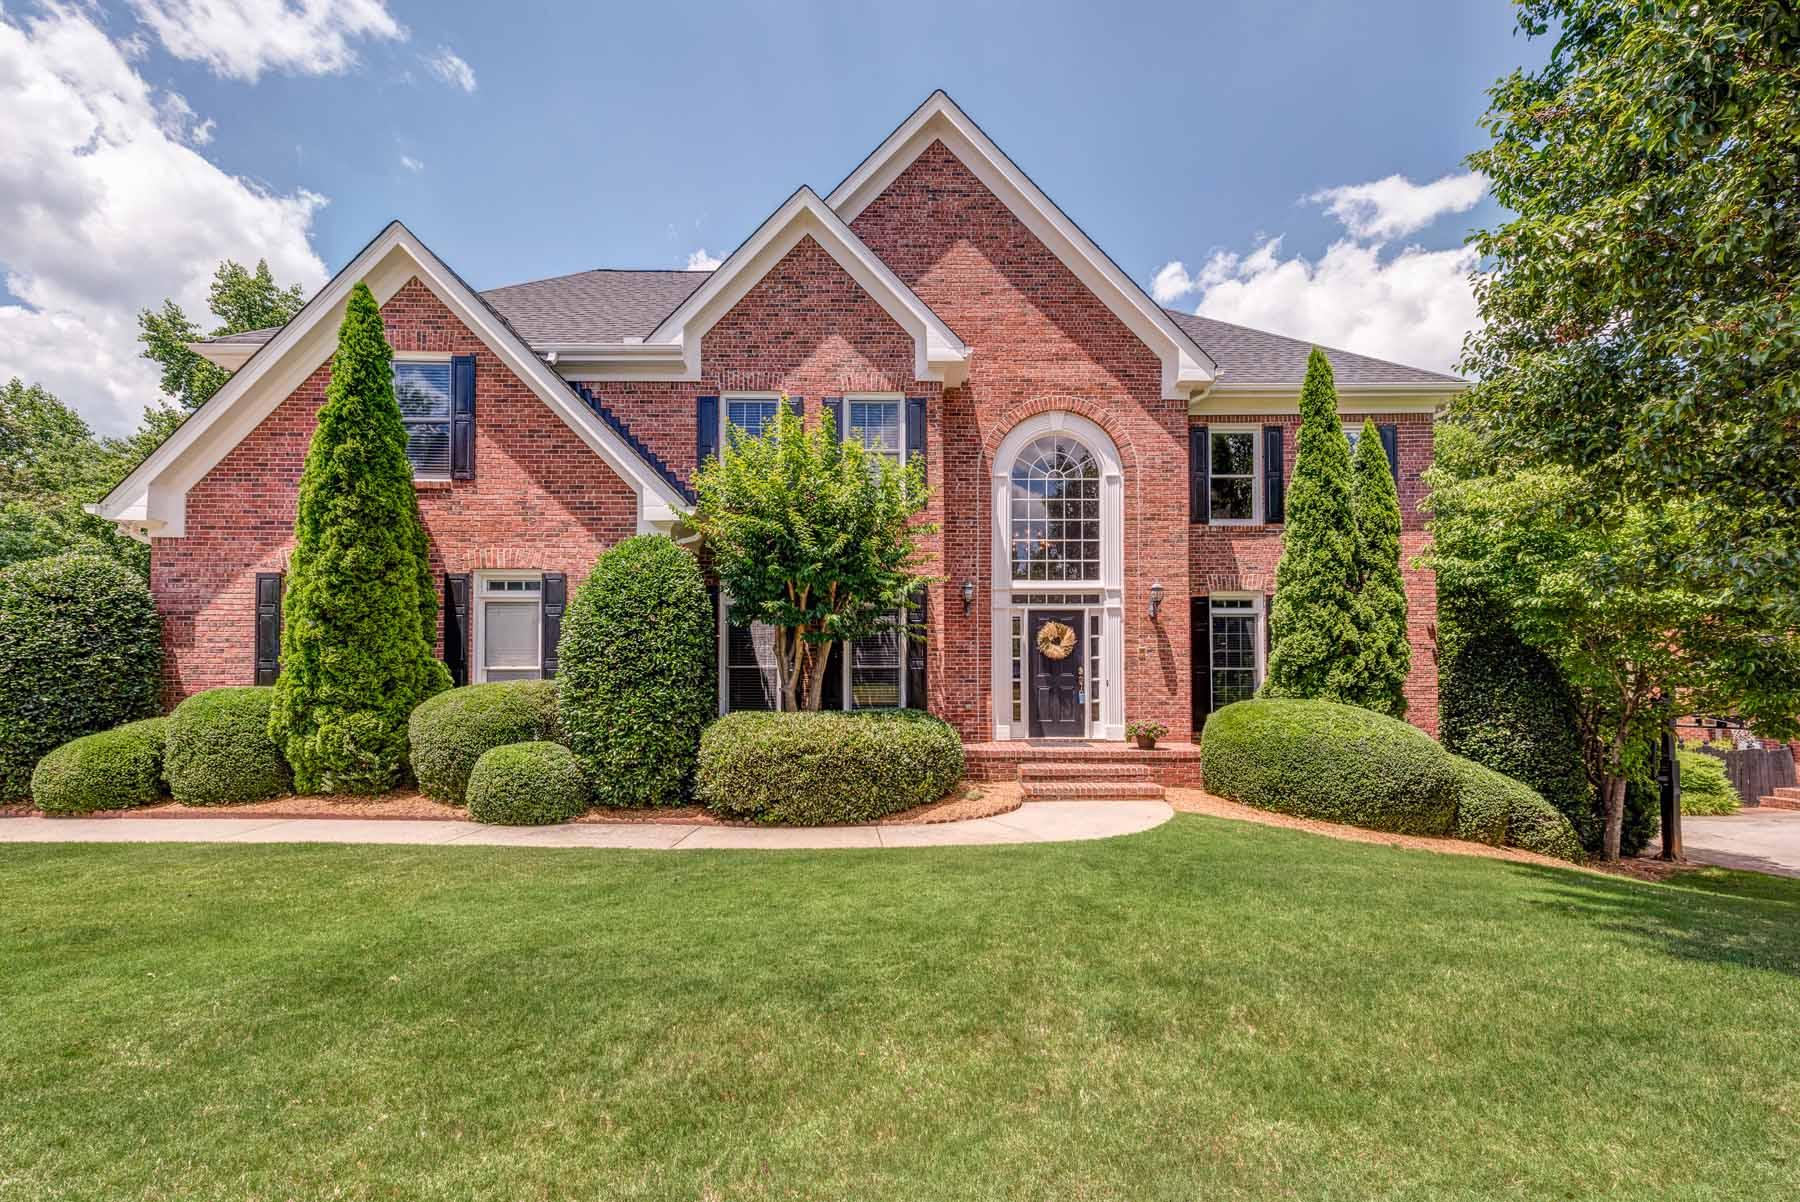 獨棟家庭住宅 為 出售 在 Beautiful Four Sides Brick Home in Alpharetta 4715 Park Brooke Trace Alpharetta, 喬治亞州, 30023 美國